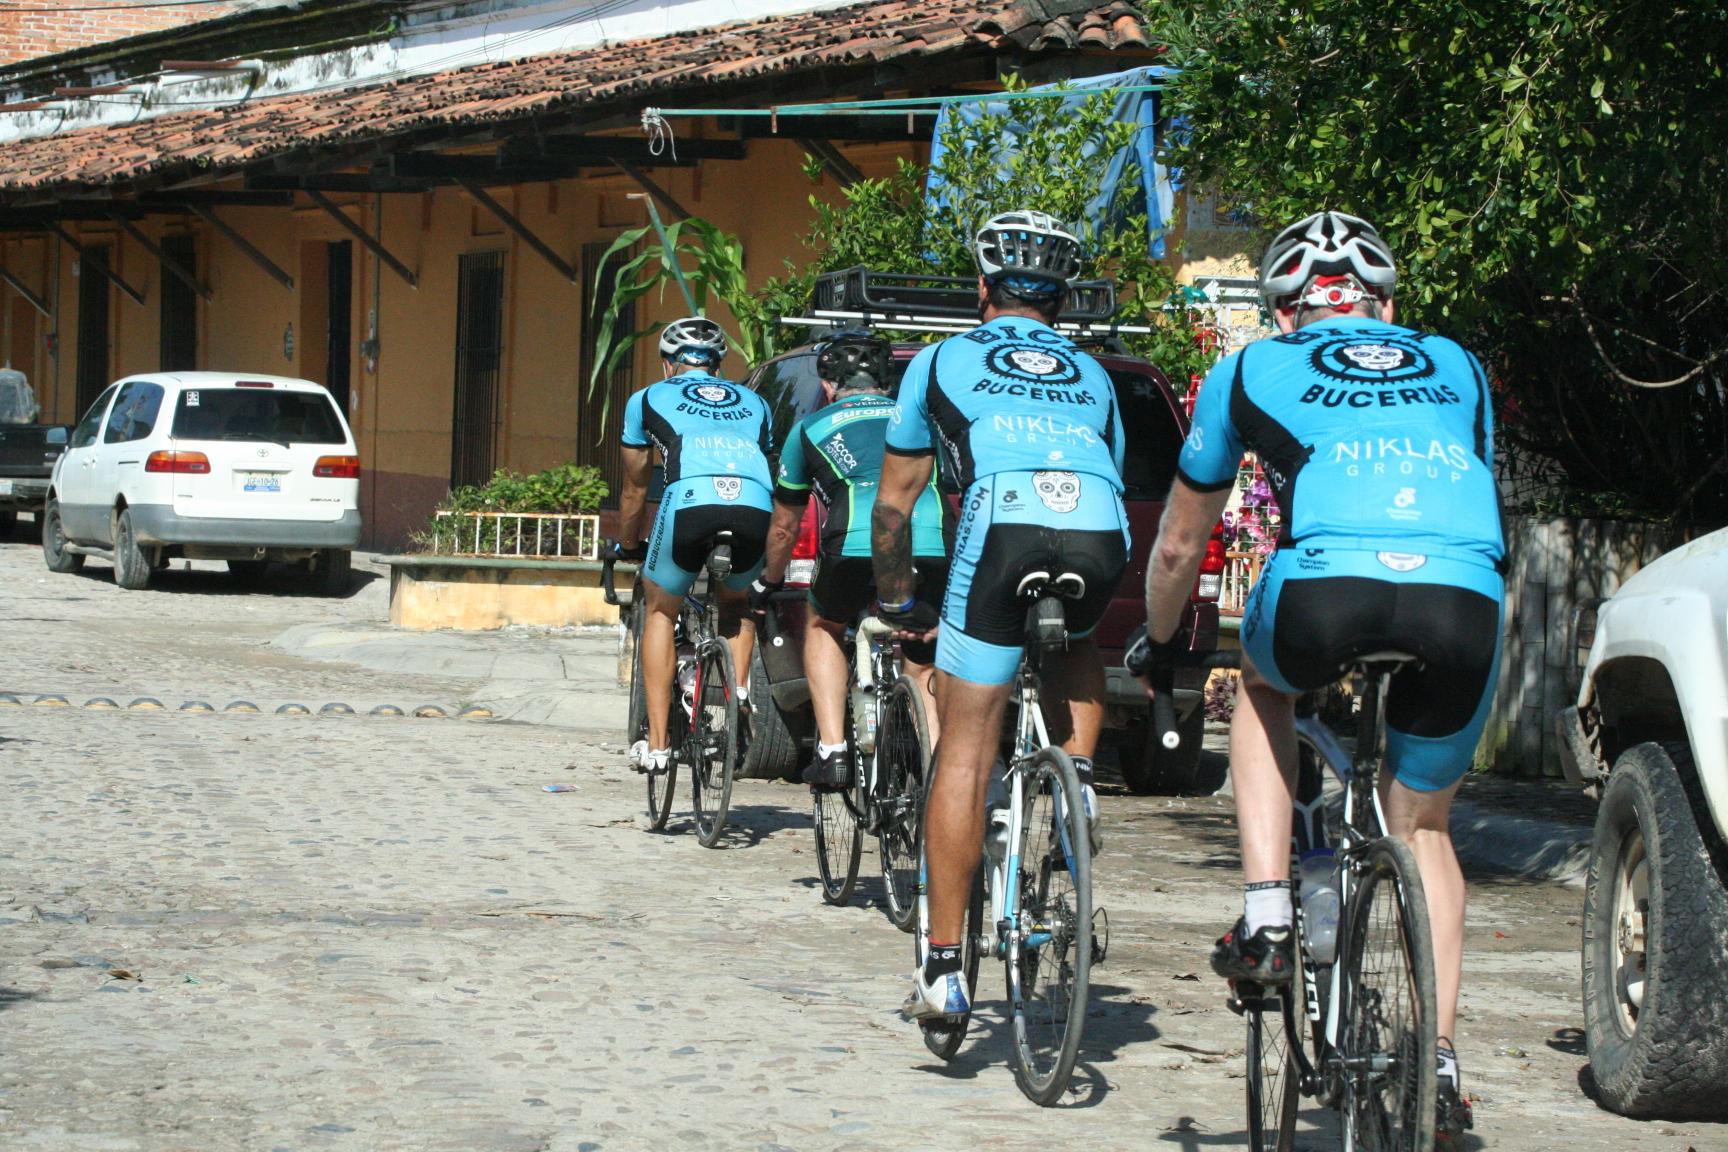 Puerto Vallarta Bike Tours - Riding the cobble of el Tuito